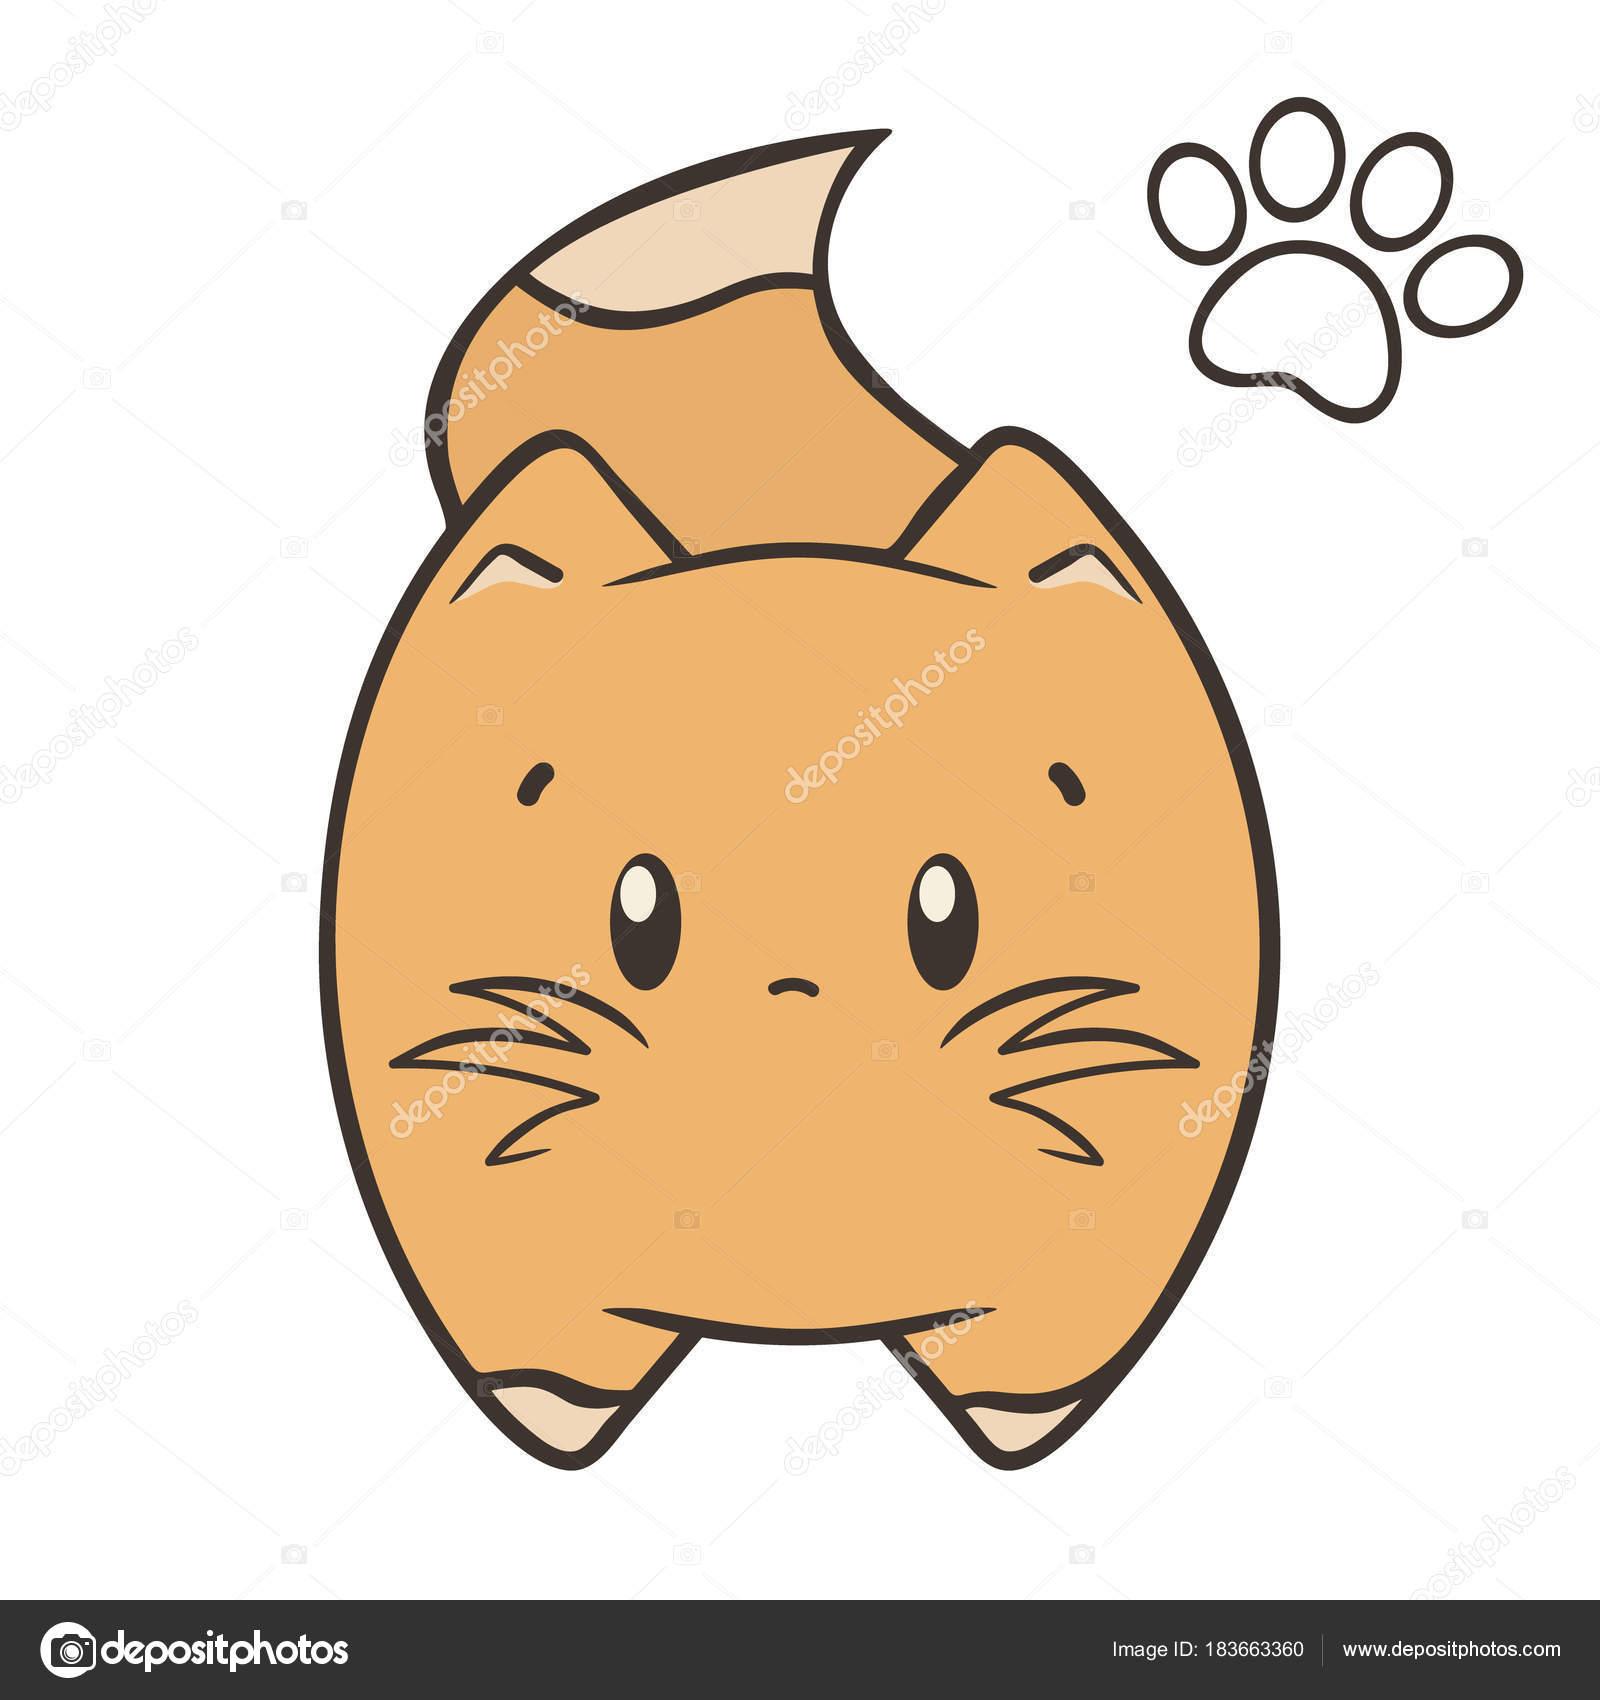 Cat Logo Kitty Minimal Flat Style Cute Cartoon Vector Toy Stock Vector C Anna 1161 183663360